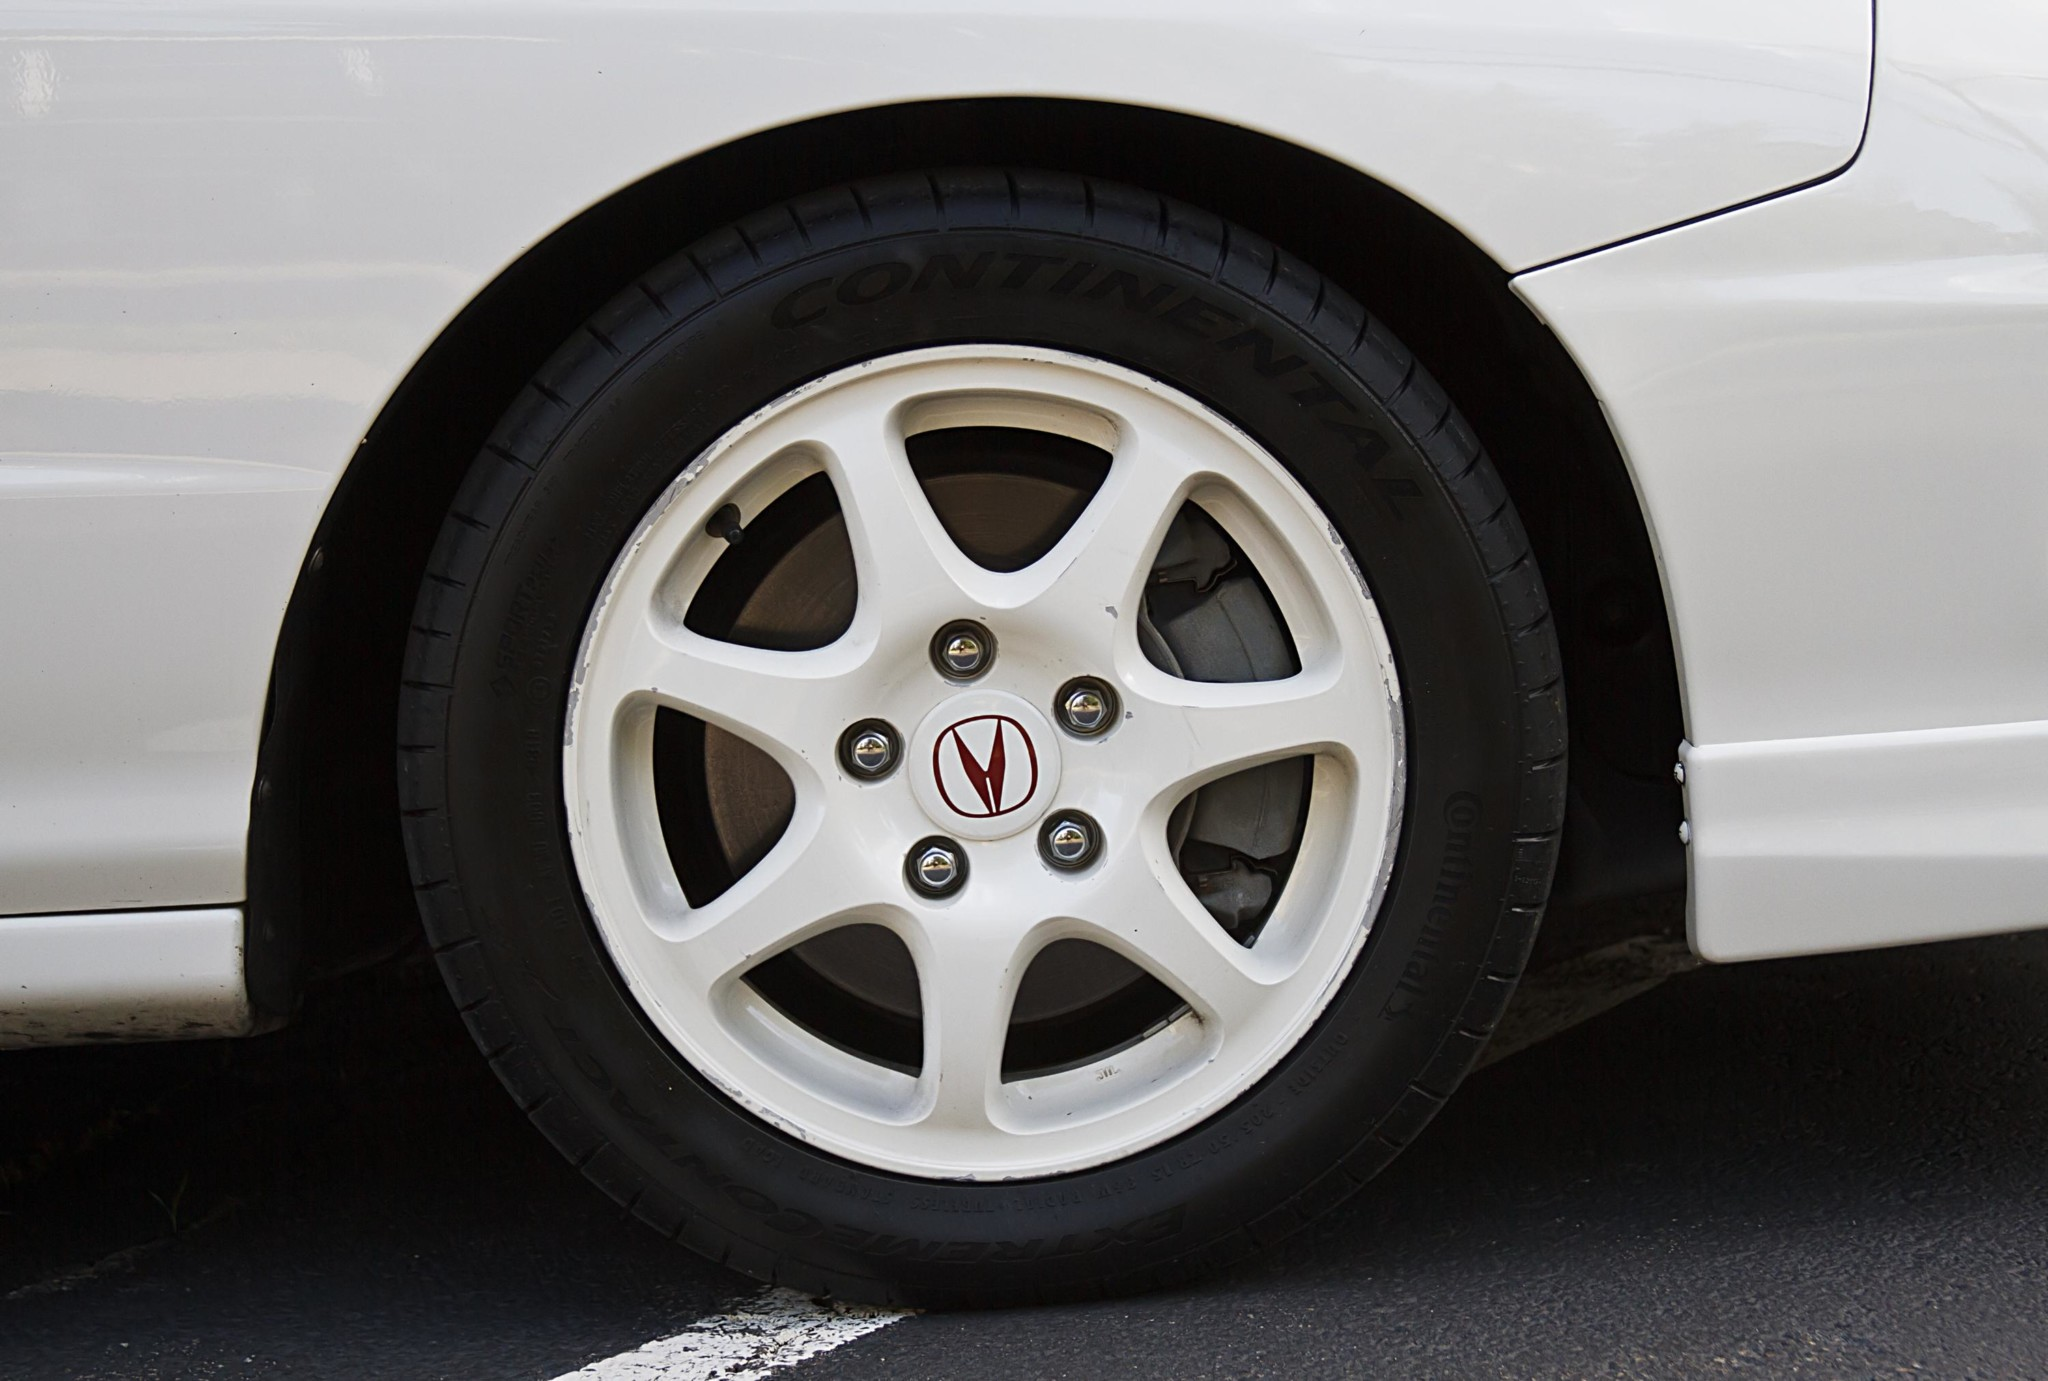 1998 Acura Integra Type R wheel detail